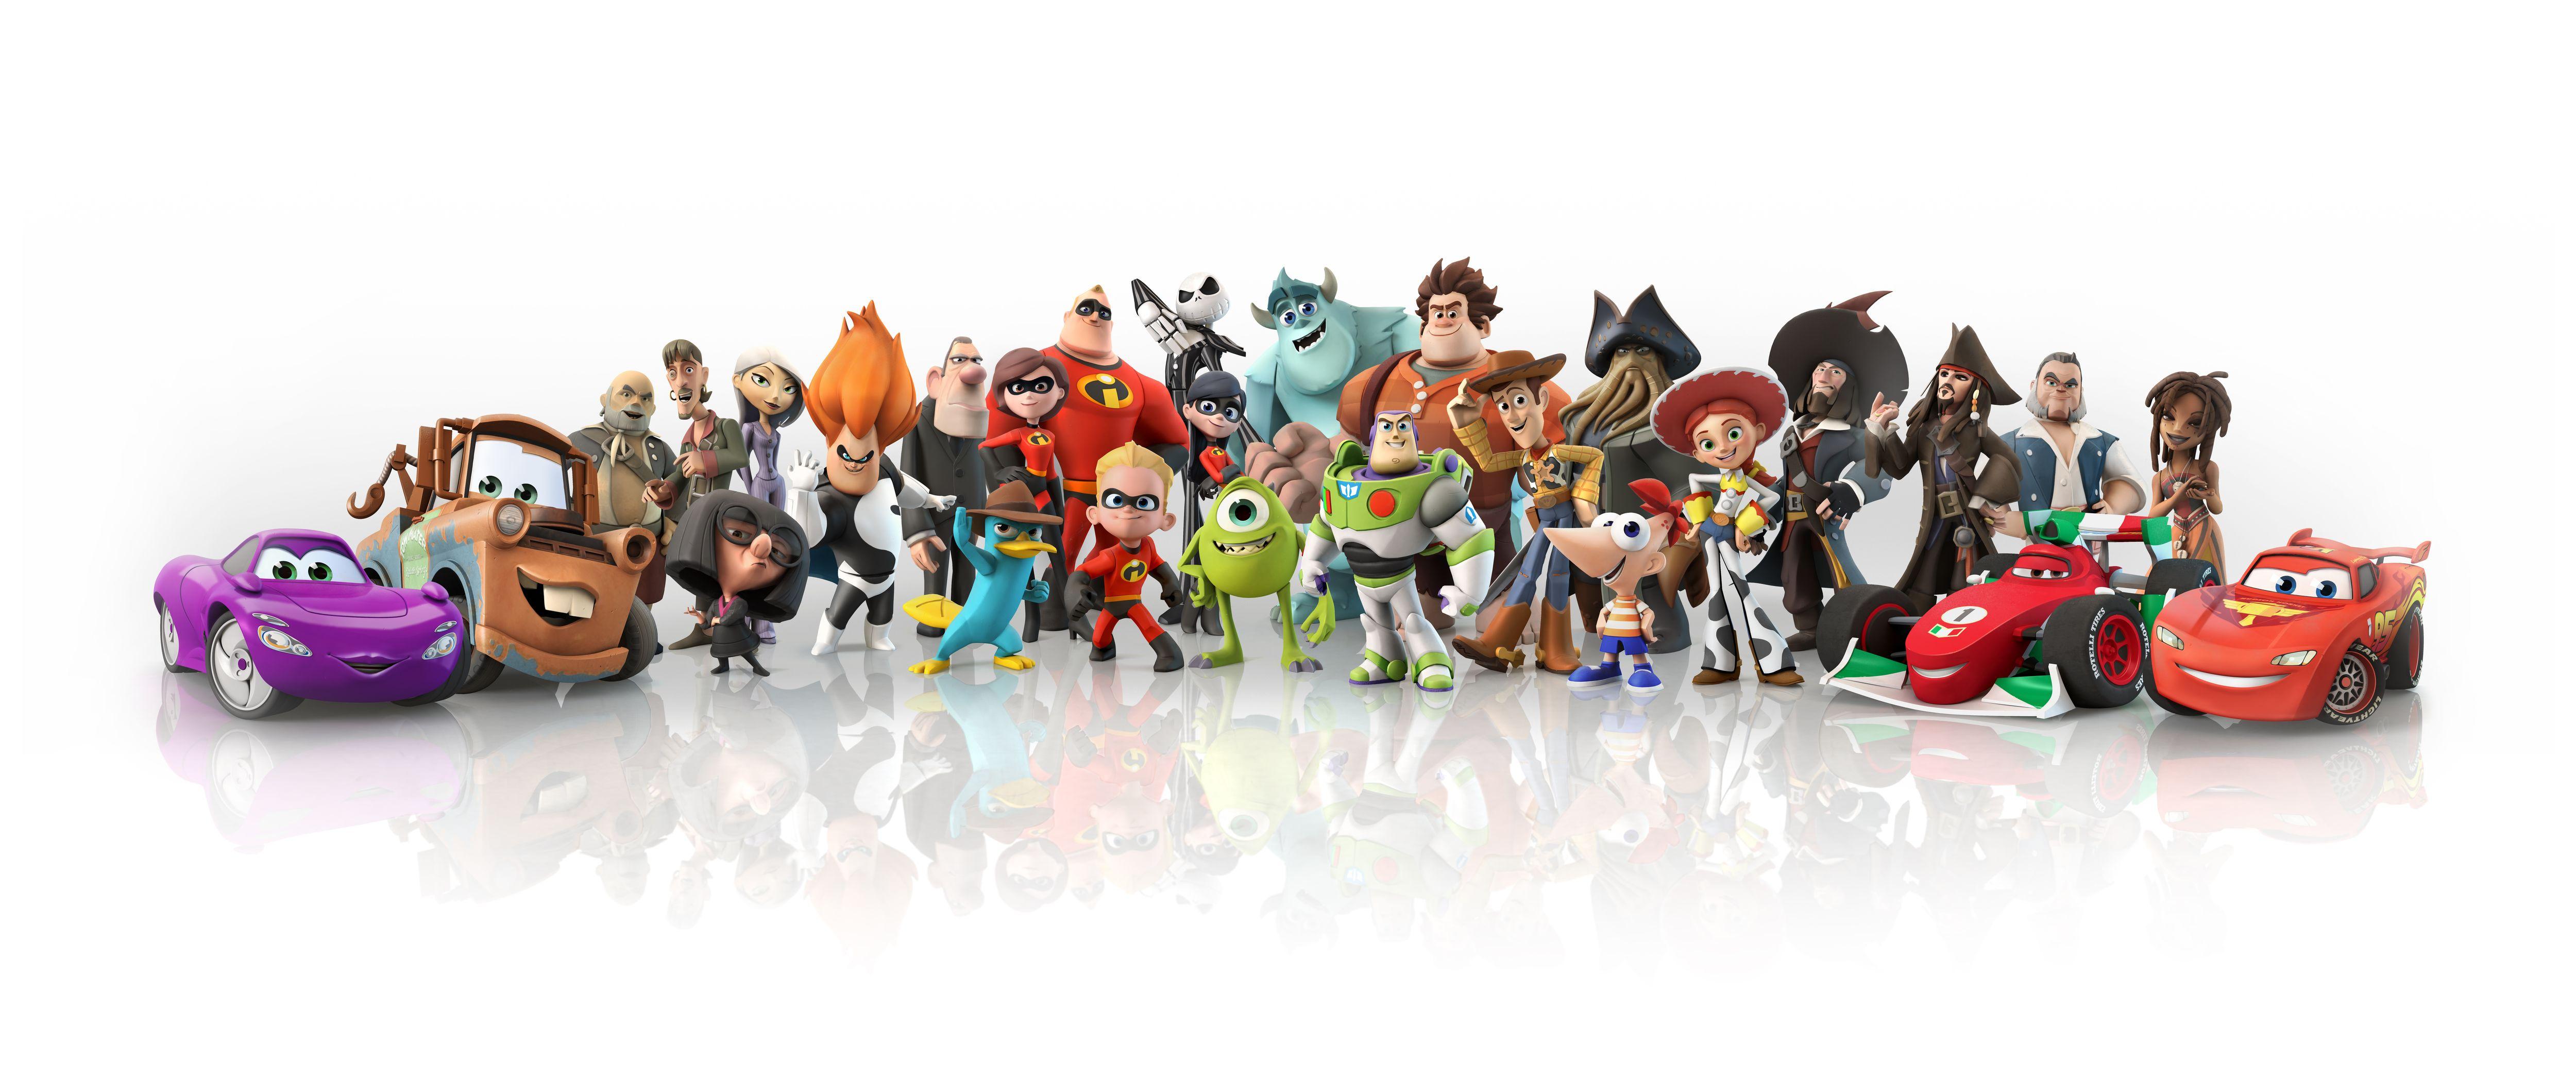 Pixar HD wallpapers, Desktop wallpaper - most viewed